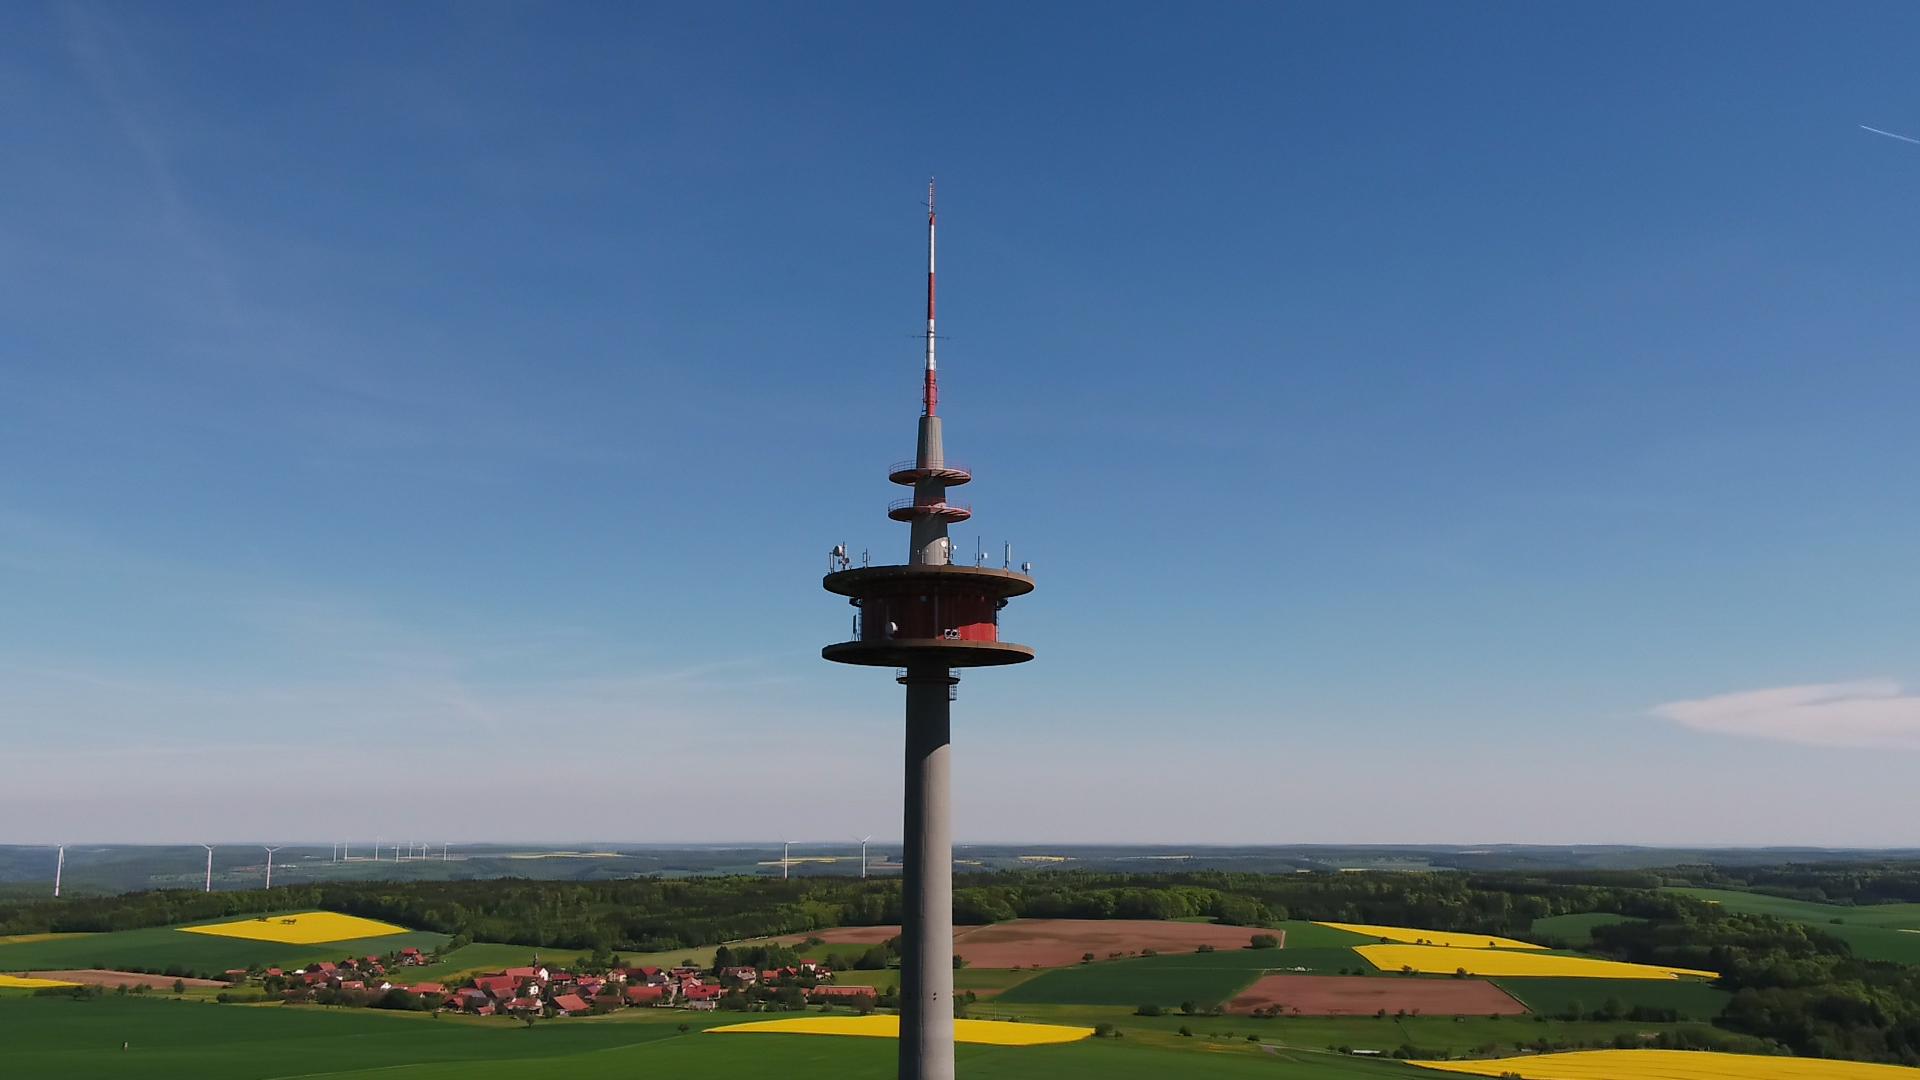 Fernsehturm Wenschdorf